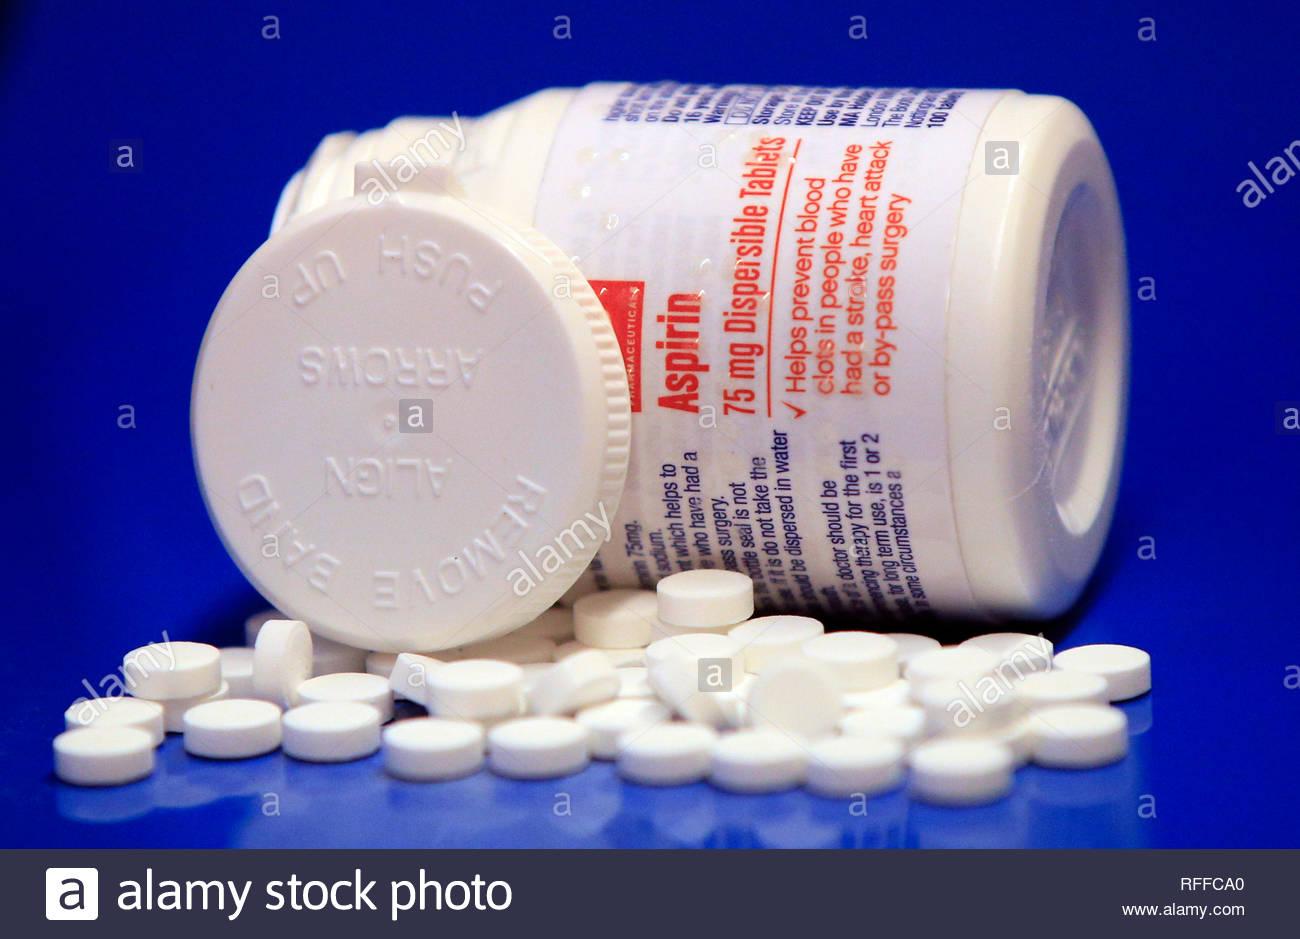 Aspirin Mit Ibuprofen